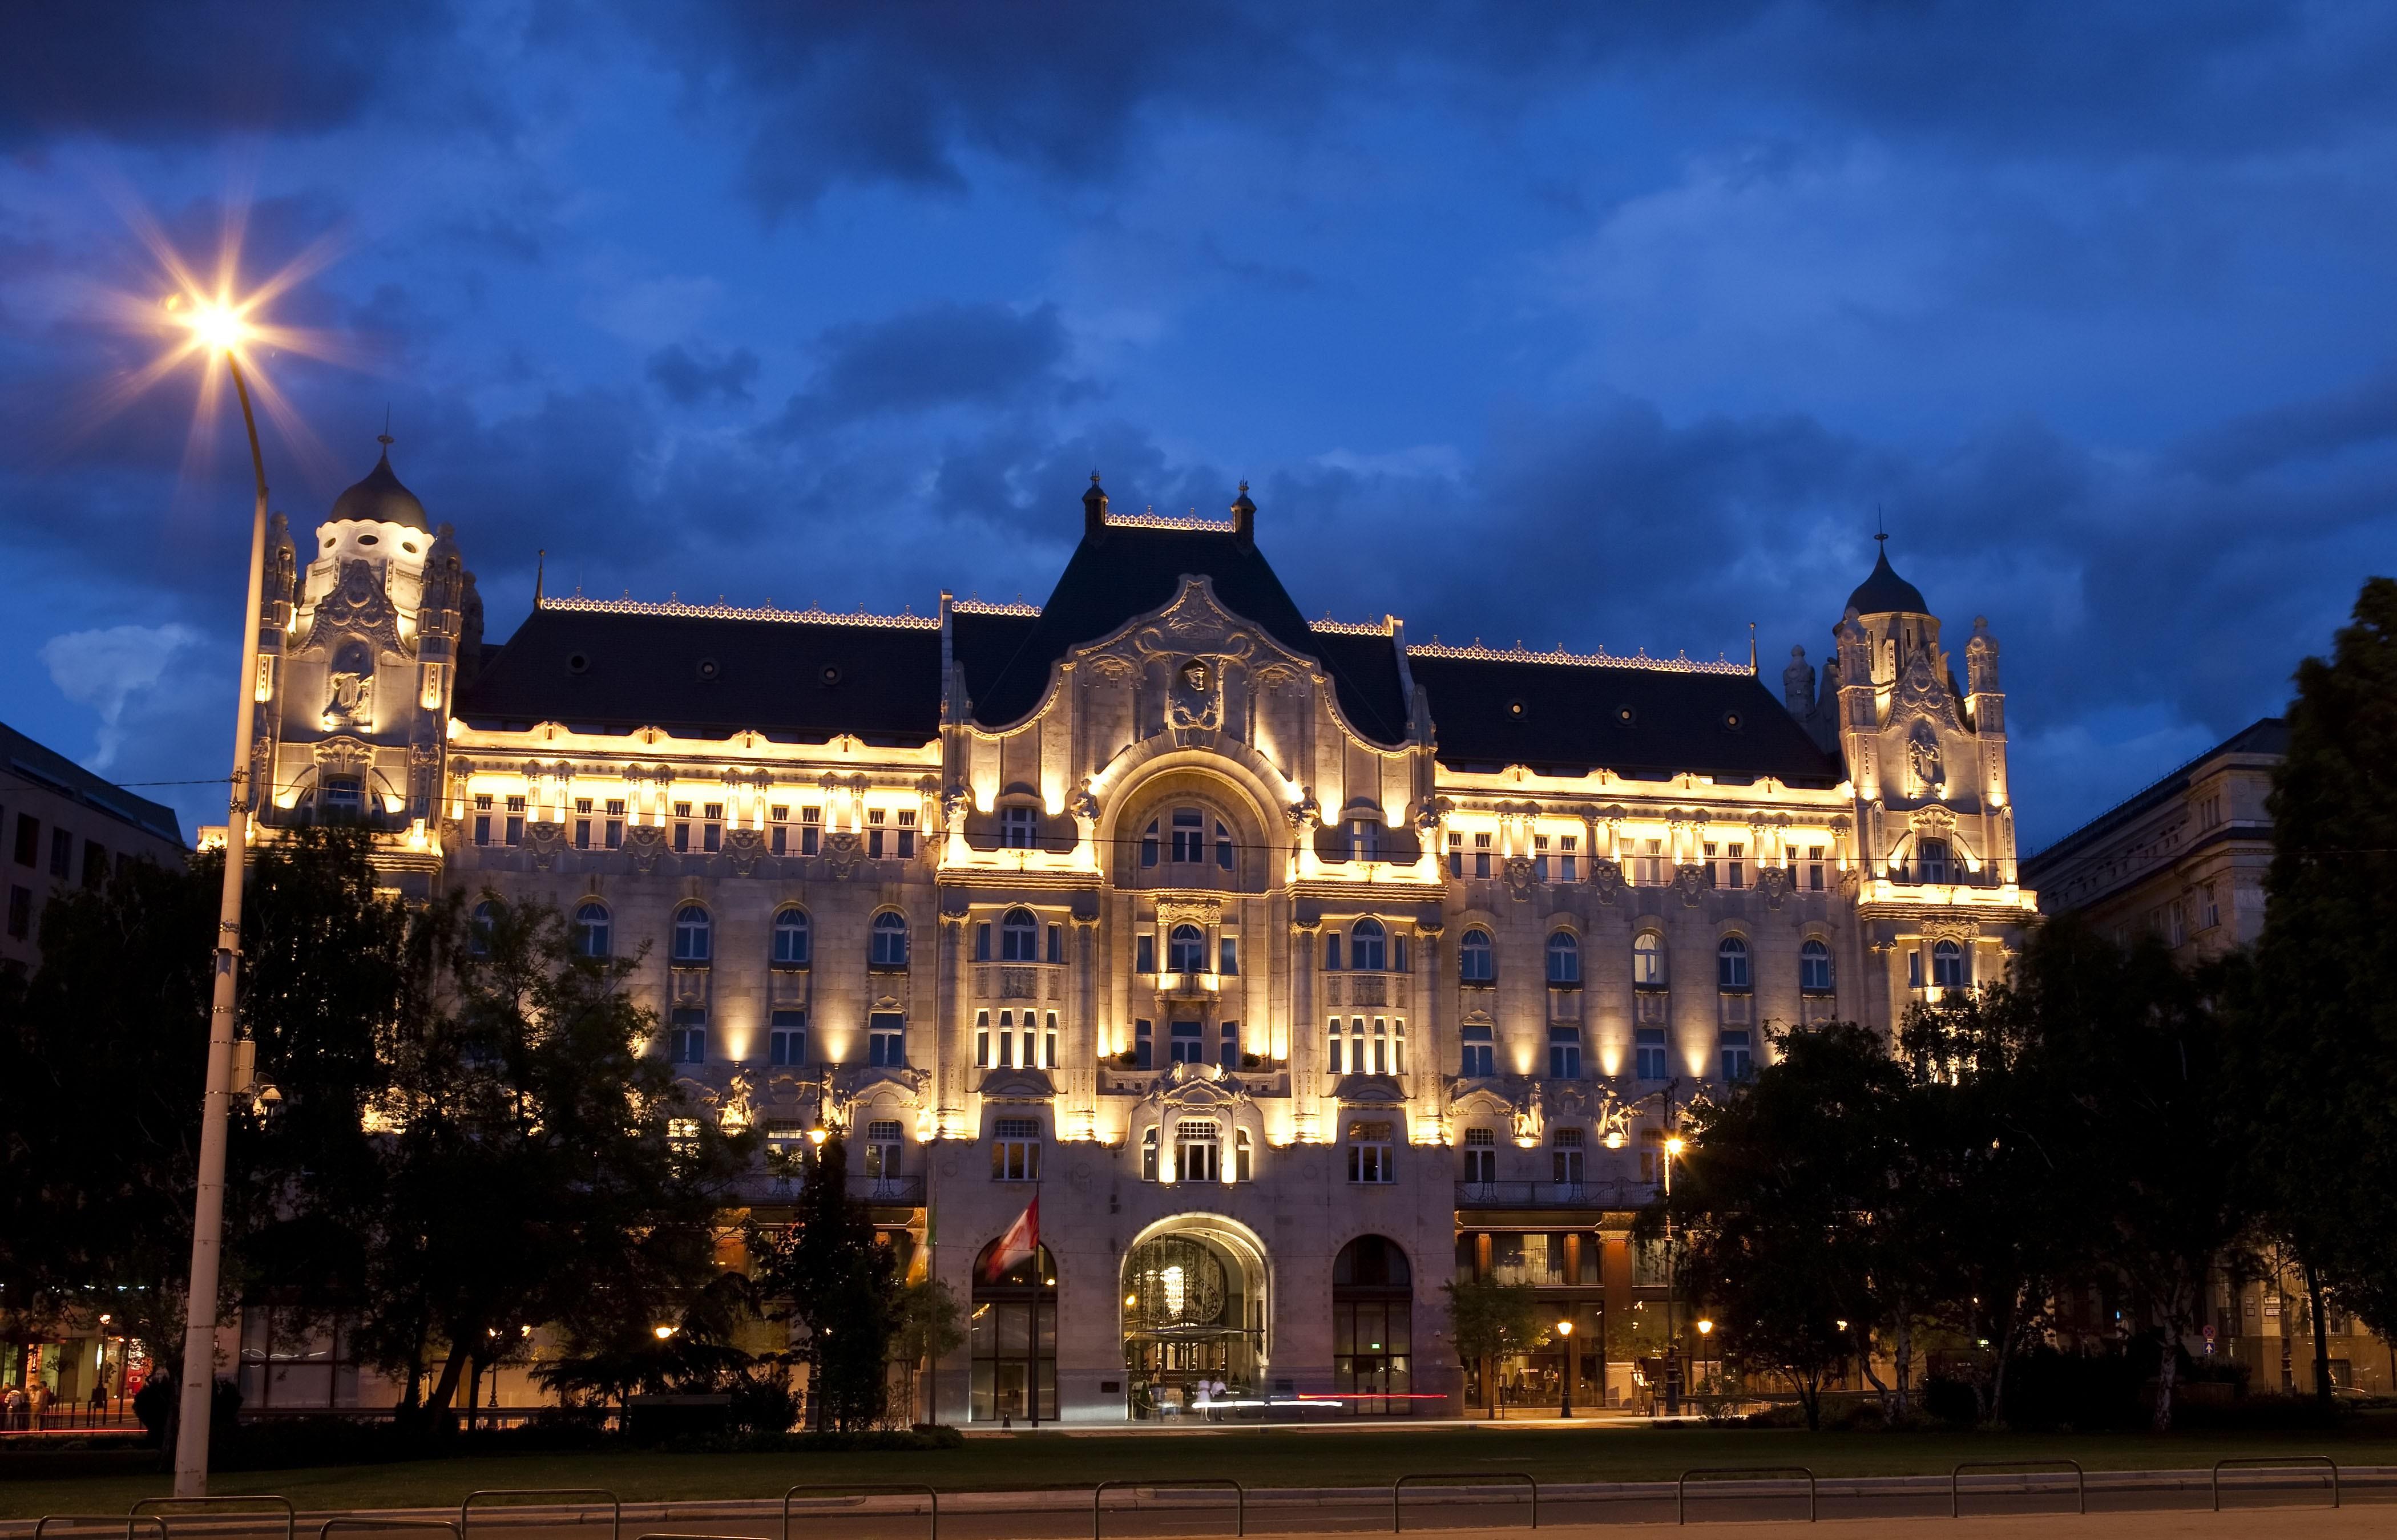 Fish Wallpaper Hd Wallpaper Four Seasons Hotel Gresham Palace Budapest